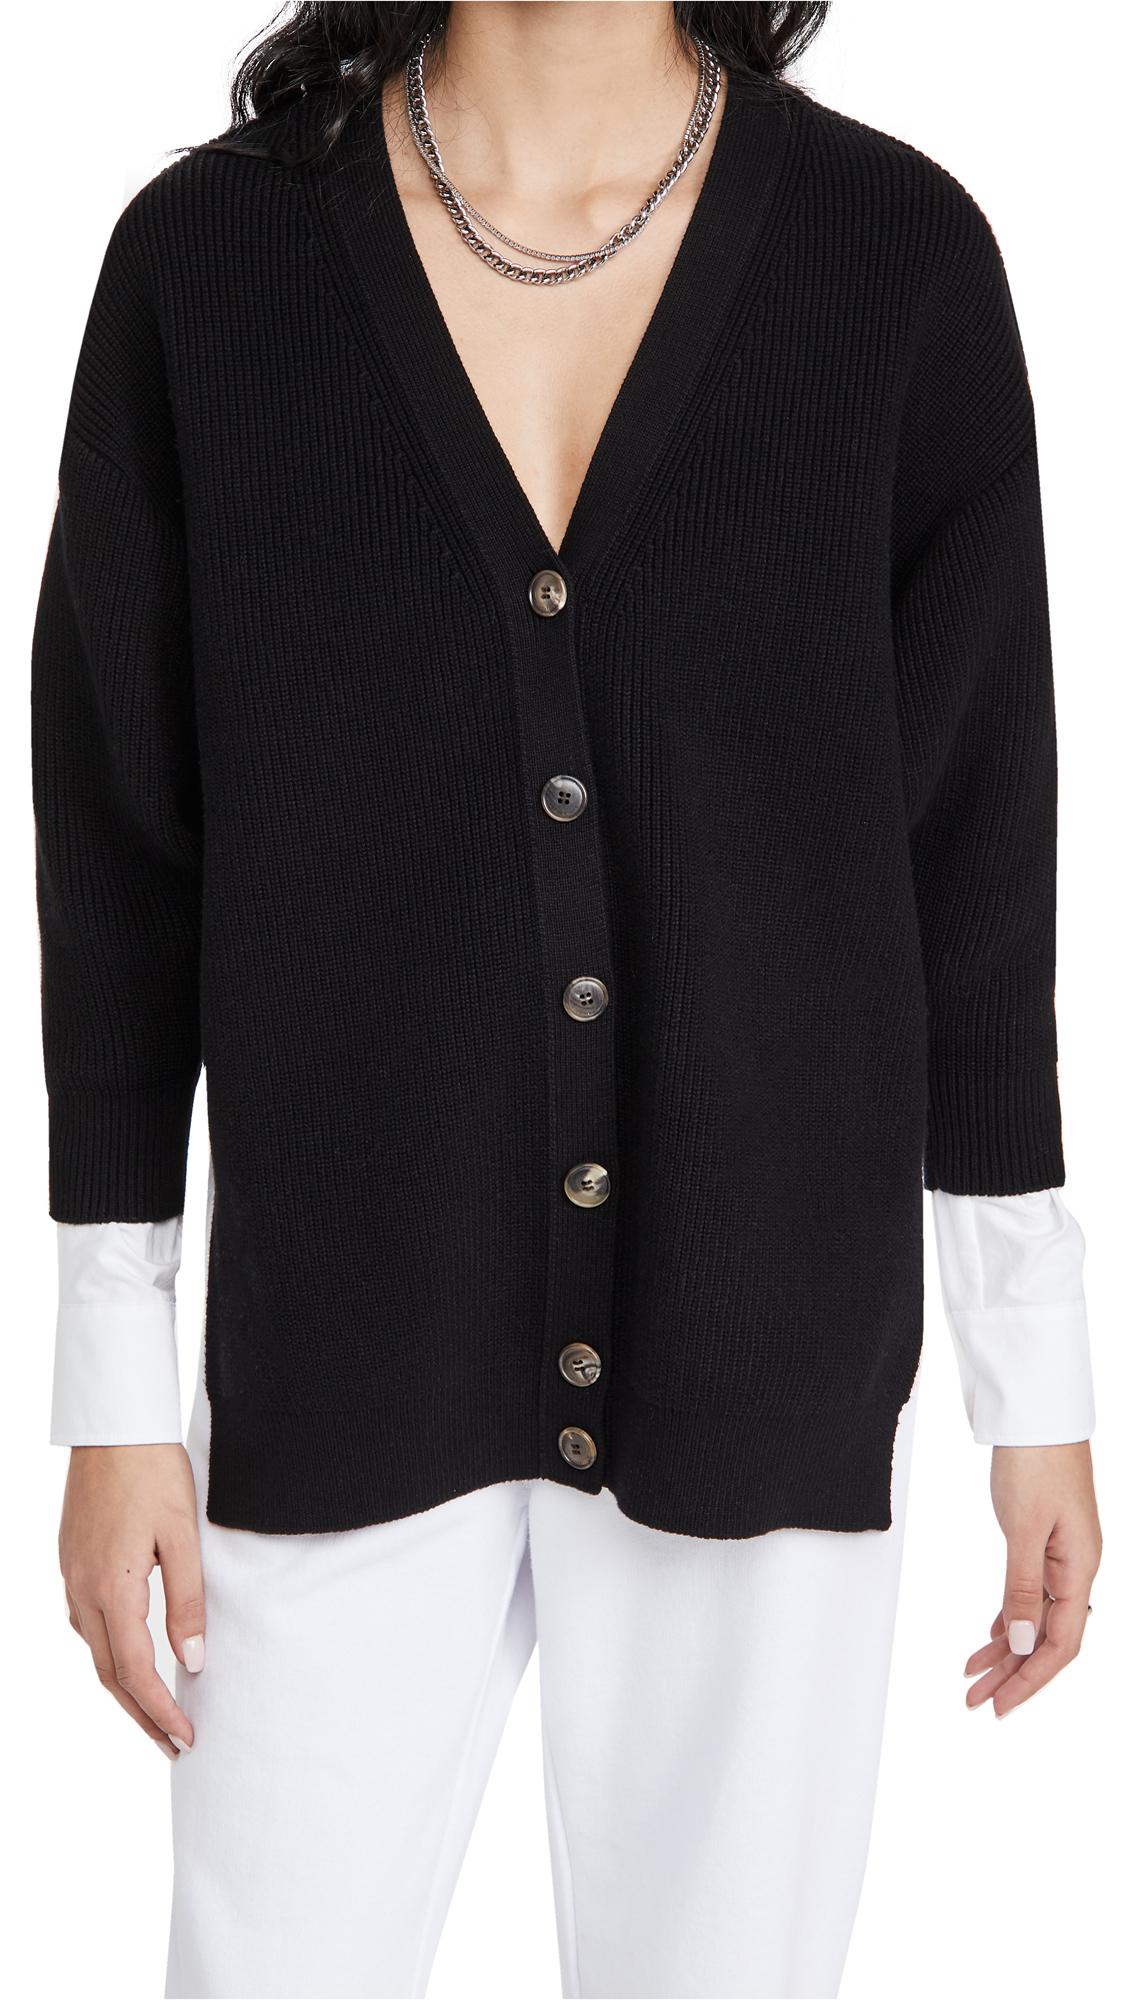 alexanderwang.t Bi-Layer V Neck Cardigan with Oxford Shirting